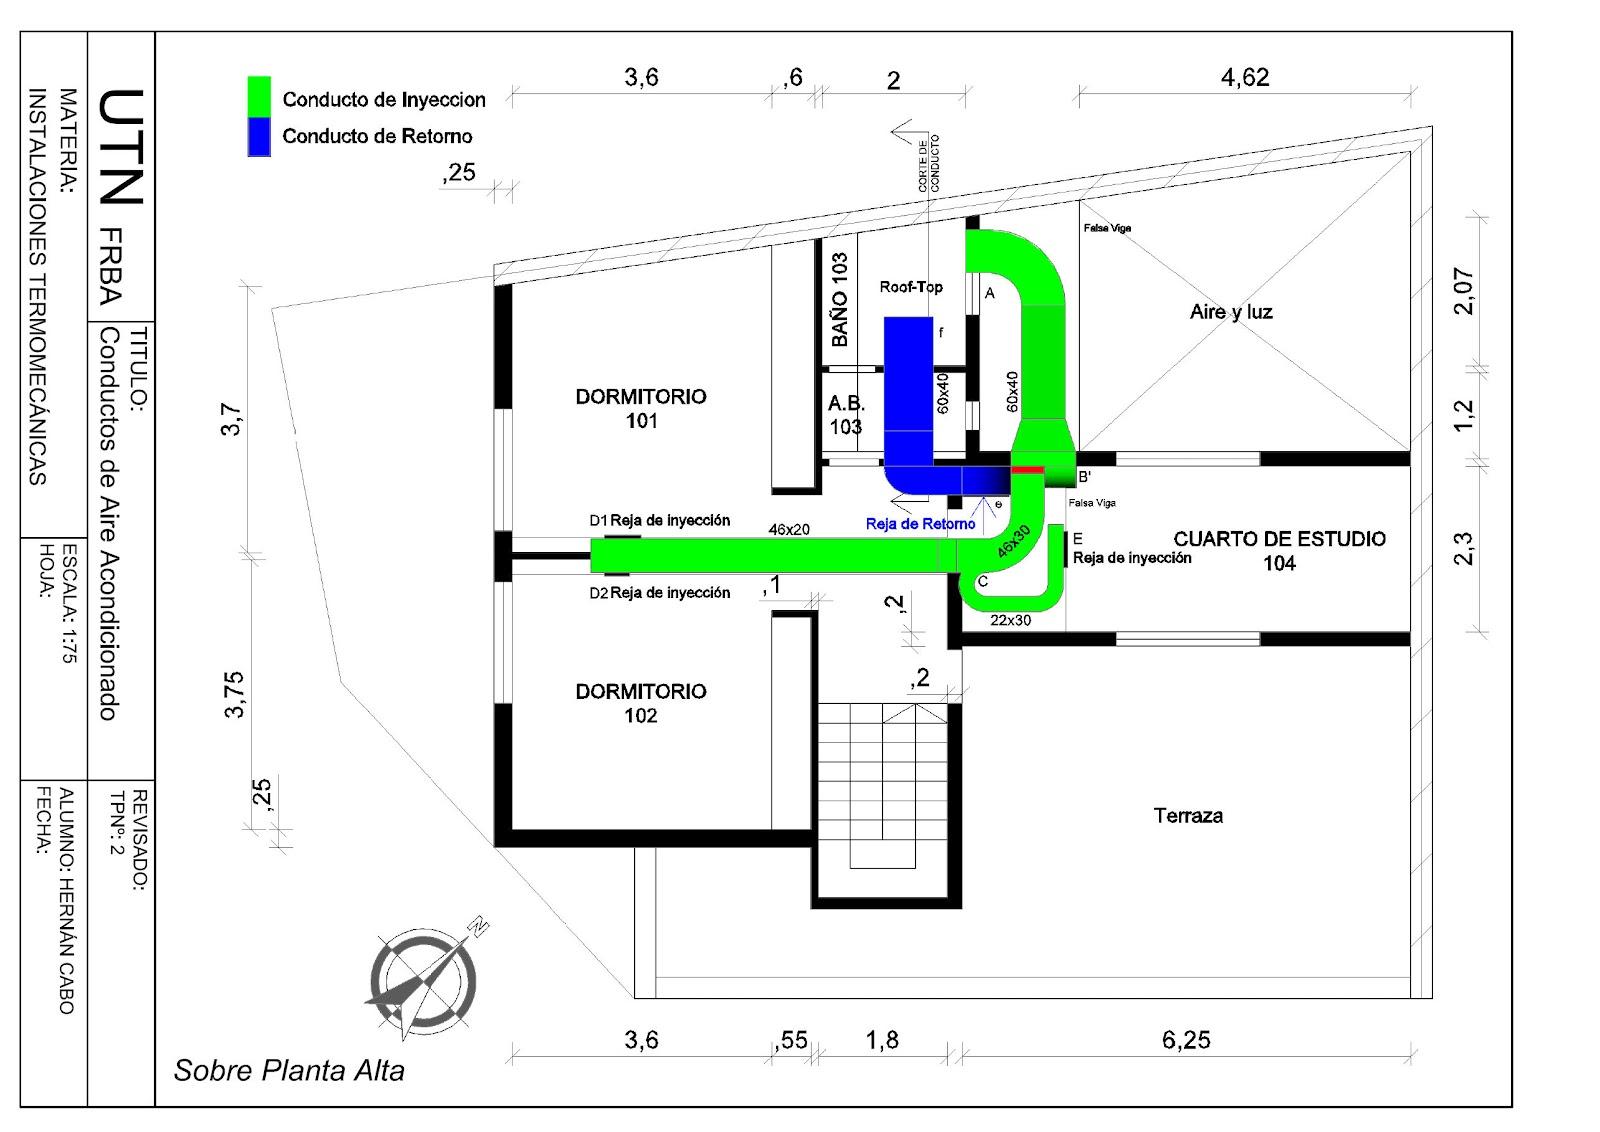 detalles constructivos cad  instalaci u00f3n domiciliaria de